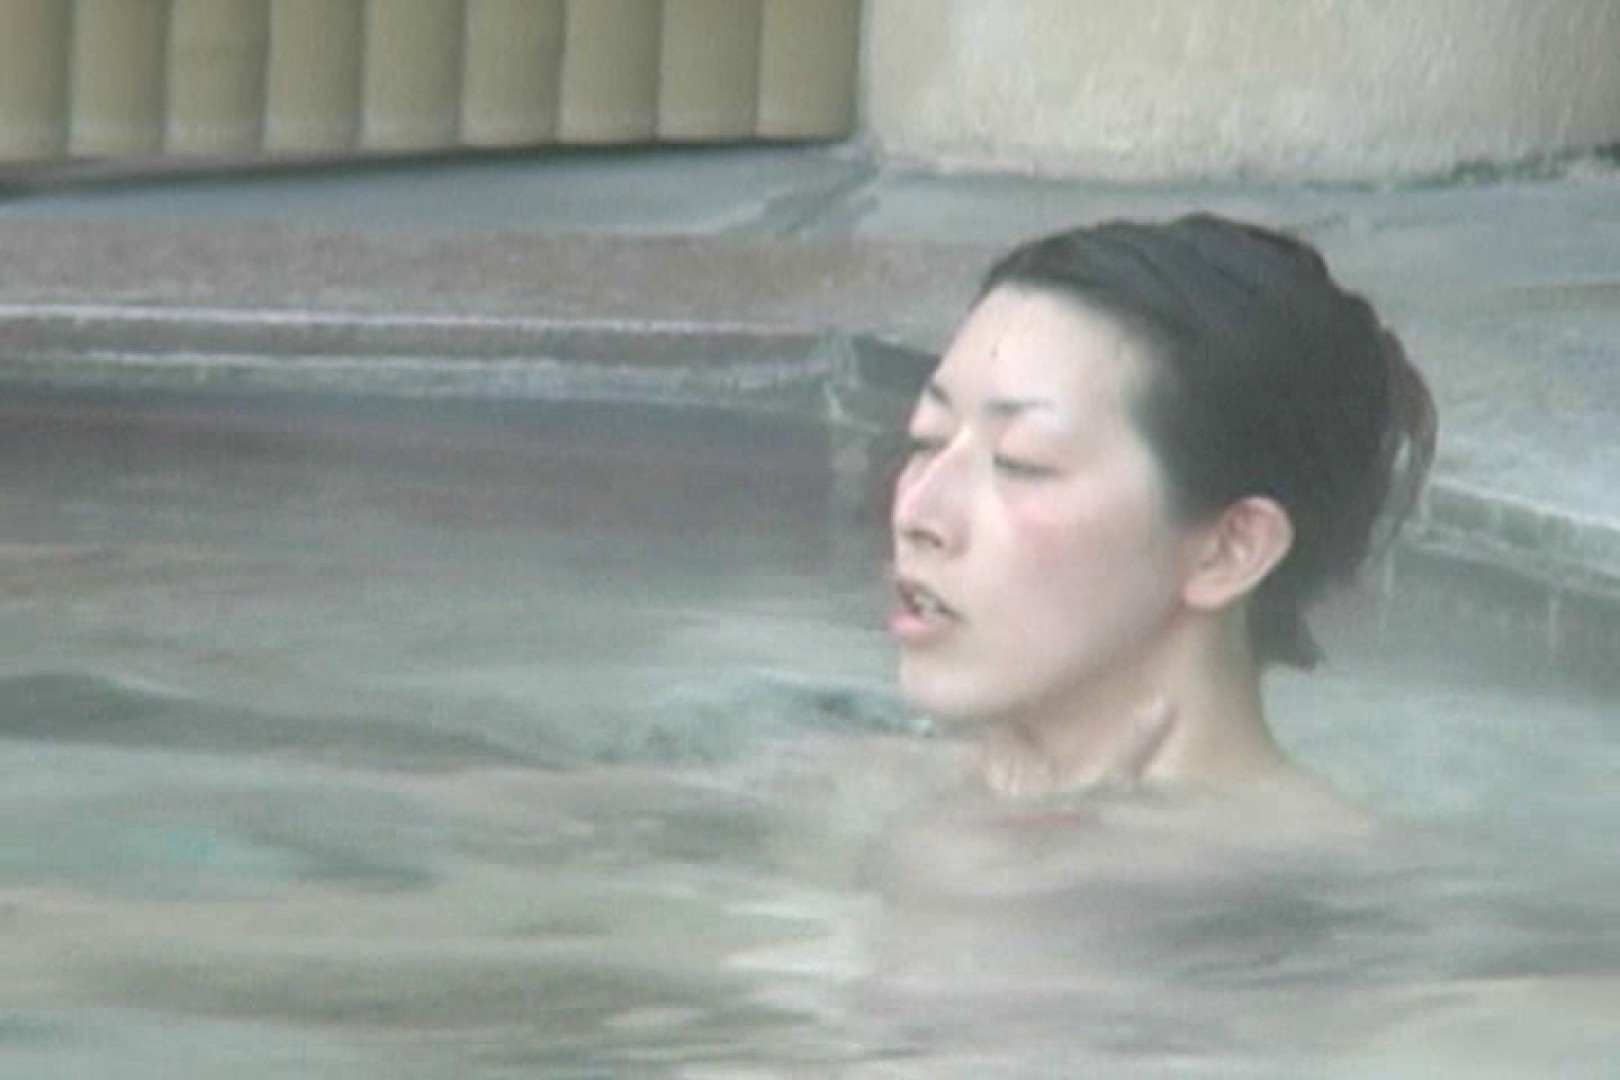 Aquaな露天風呂Vol.589 盗撮 | HなOL  105pic 3